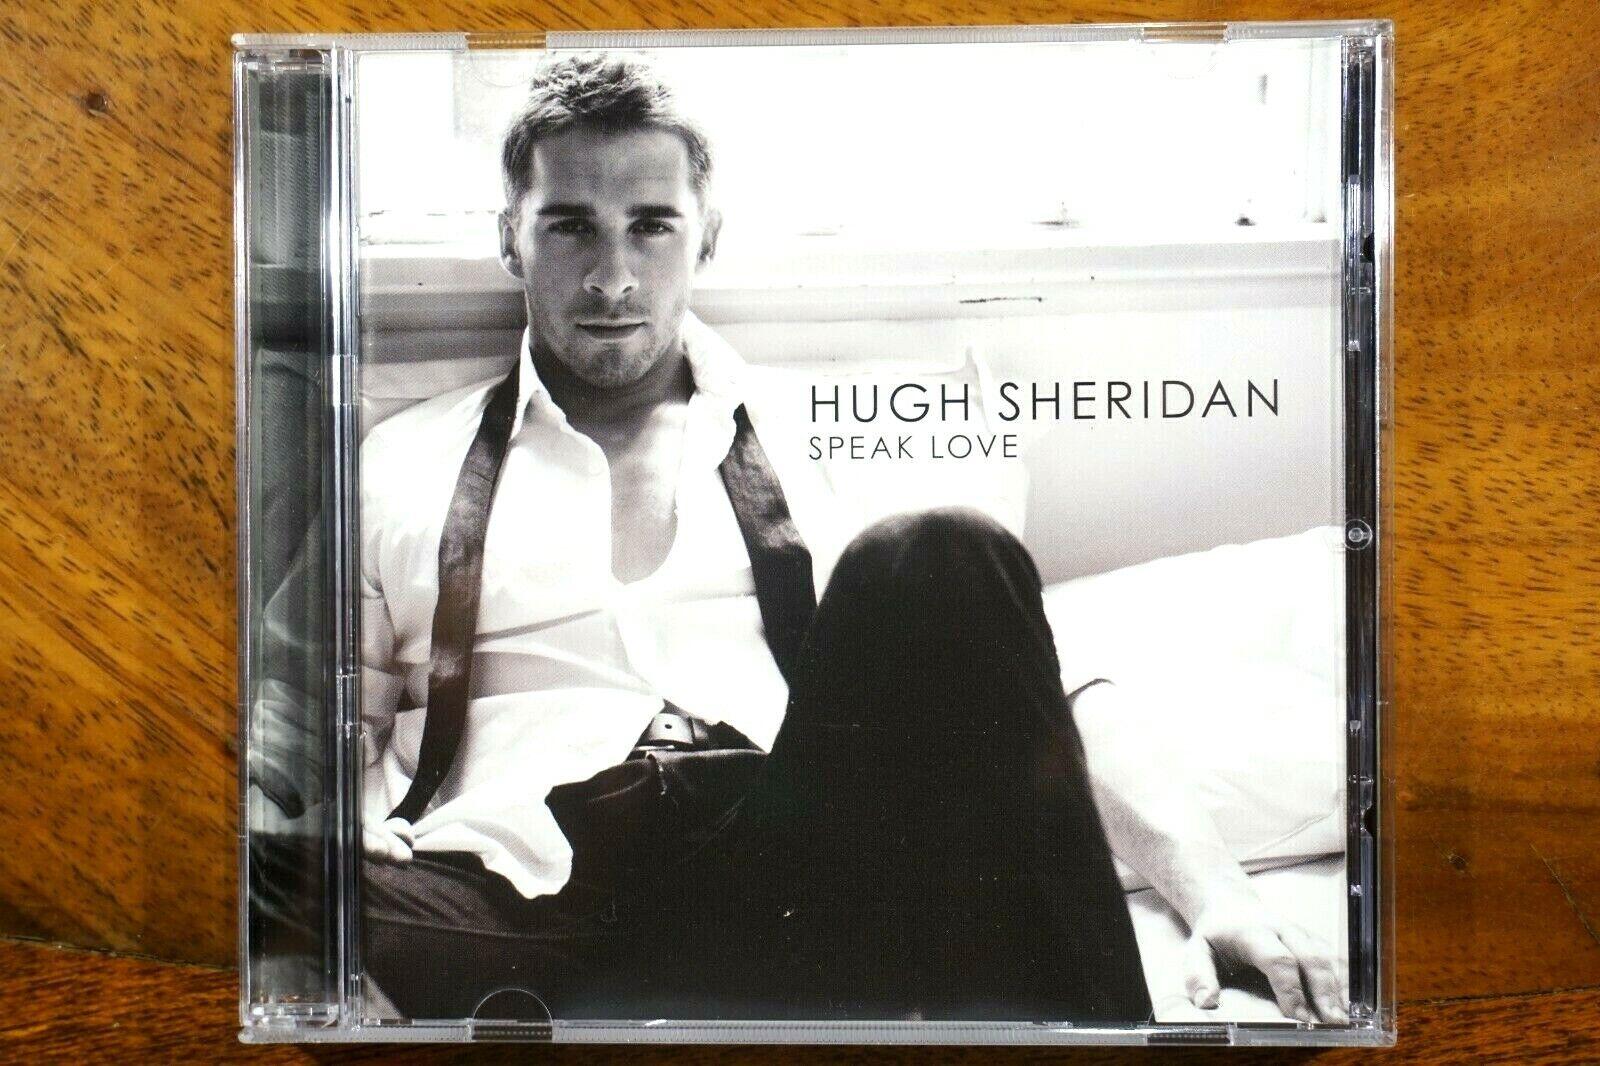 Hugh Sheridan - Speak Love - CD, VG